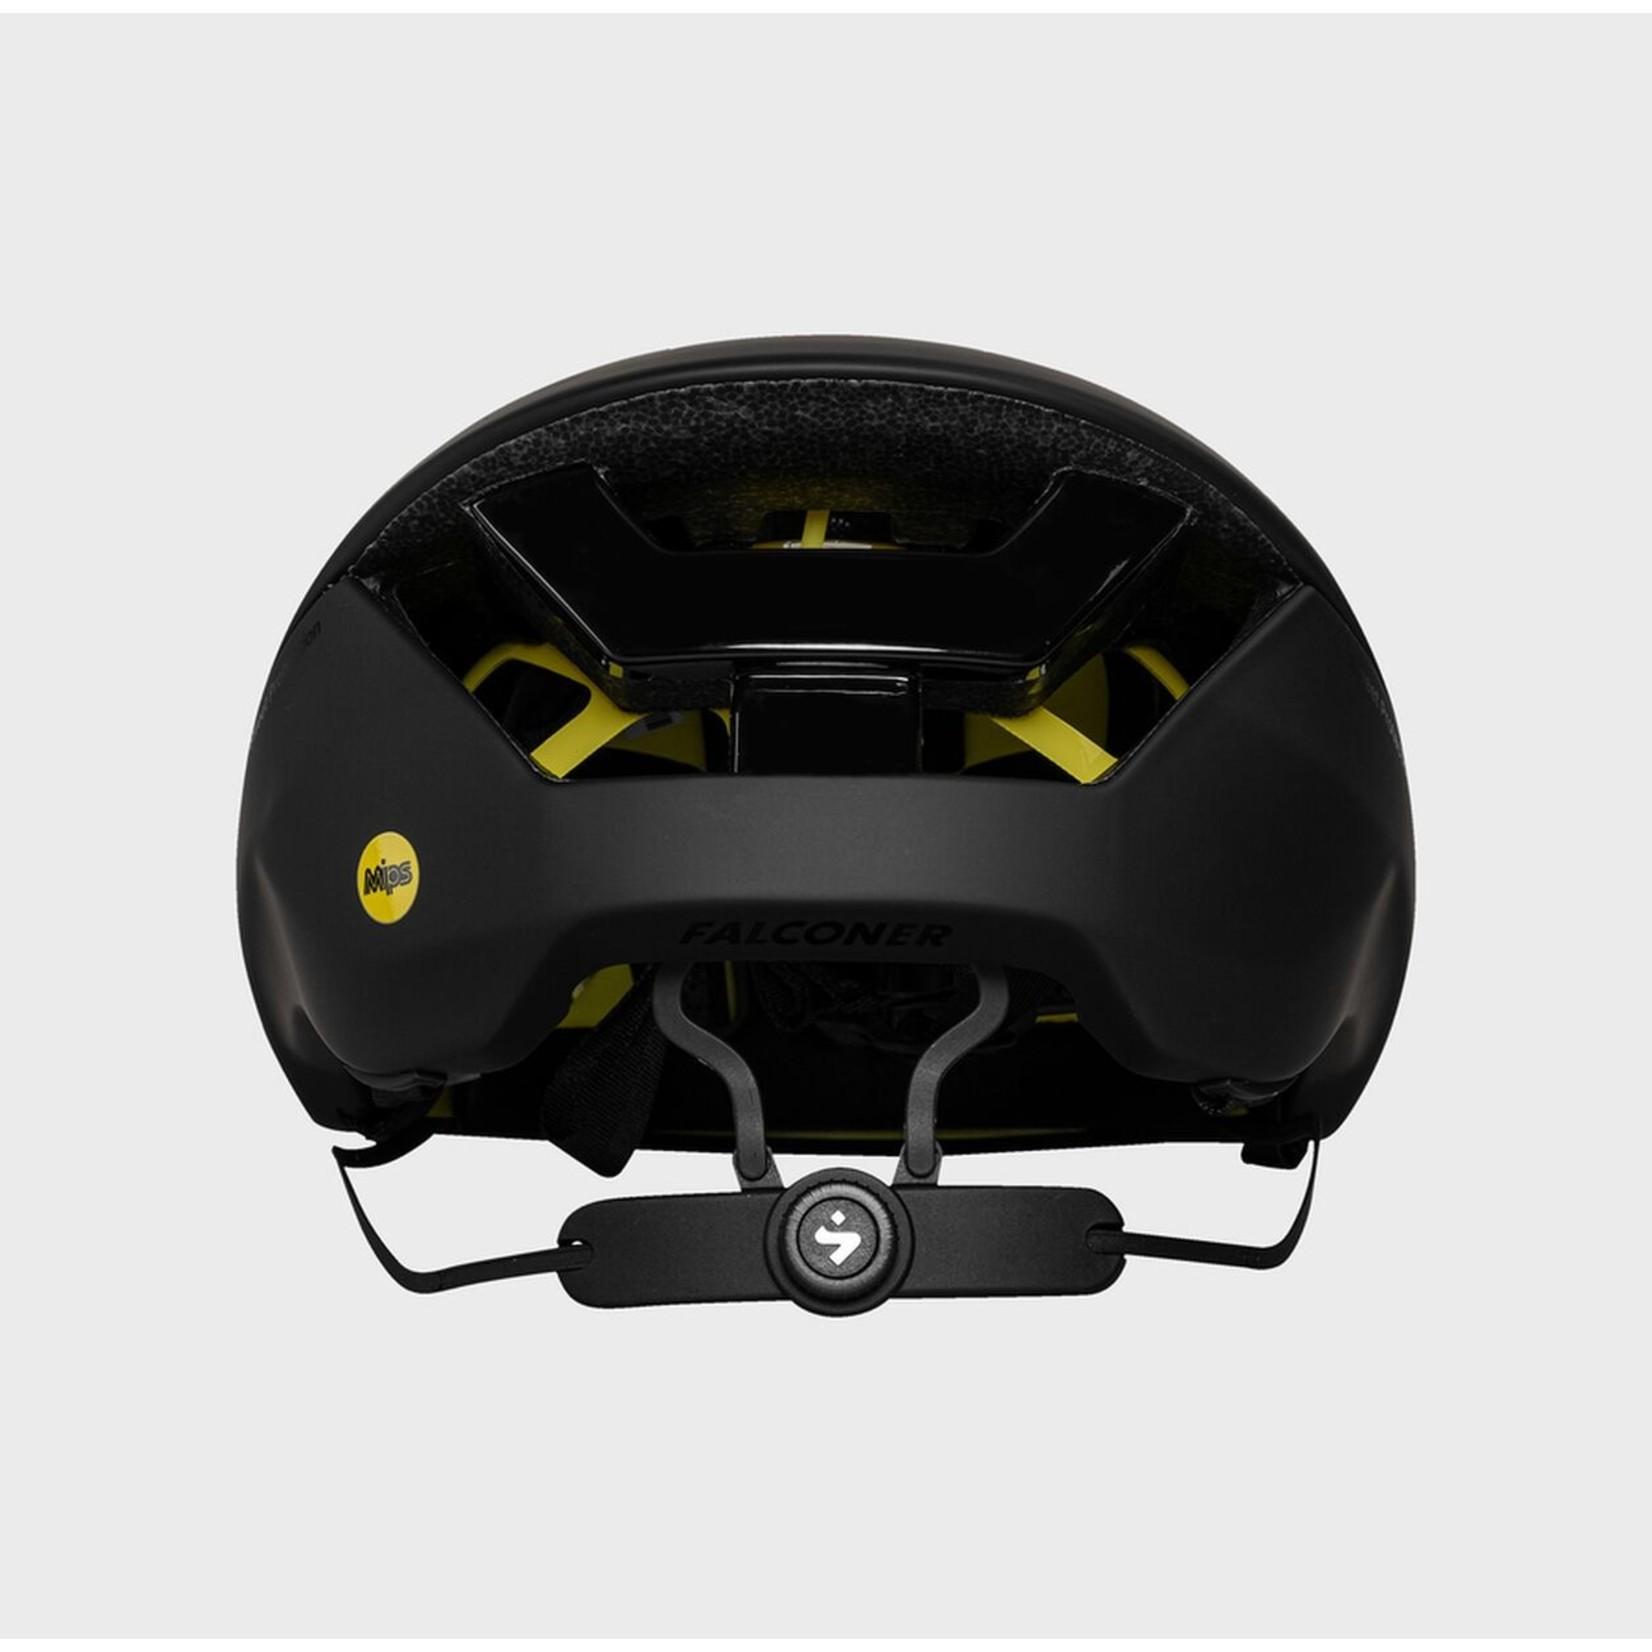 Sweet Protection Sweet Protection Falconer II Aero Mips Helmet - All Black